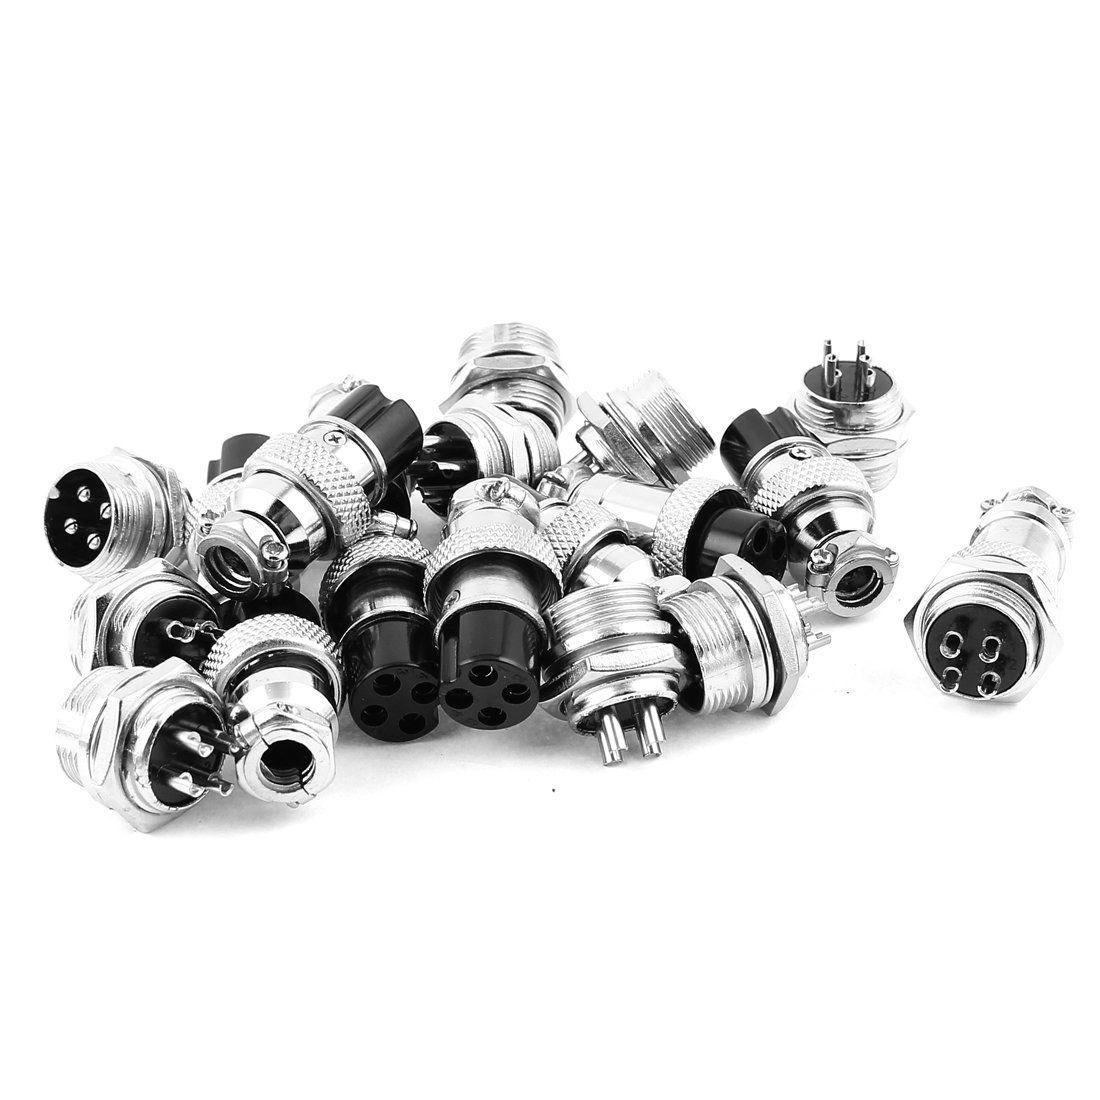 16mm Thread 4 Pins Panel Metal Aviation Plug Wire